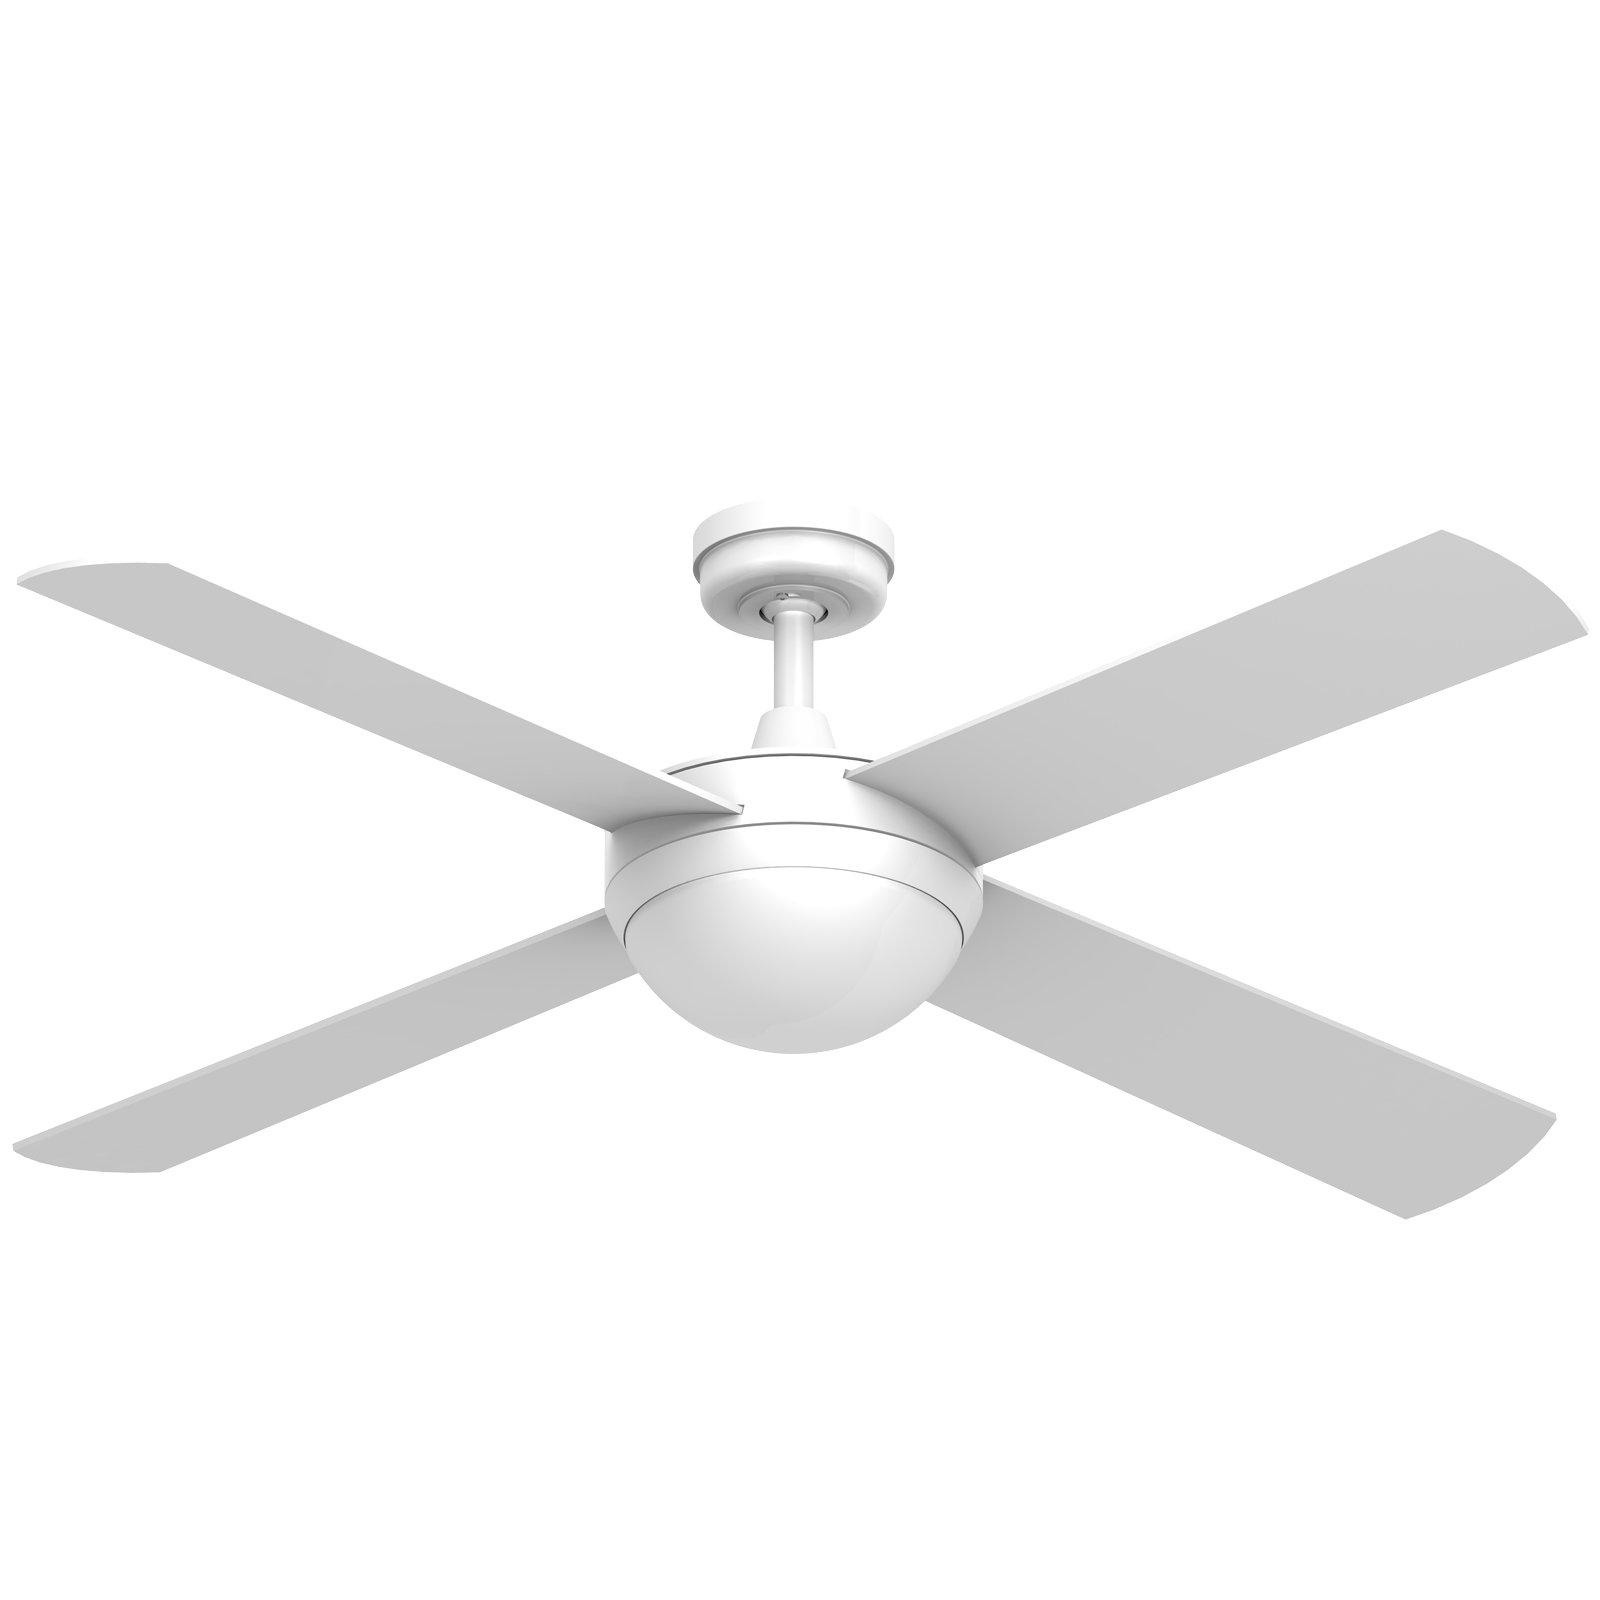 Ceiling fans electriciansupplies electriciansupplies hunter pacific intercept 2 white led fan light mozeypictures Choice Image